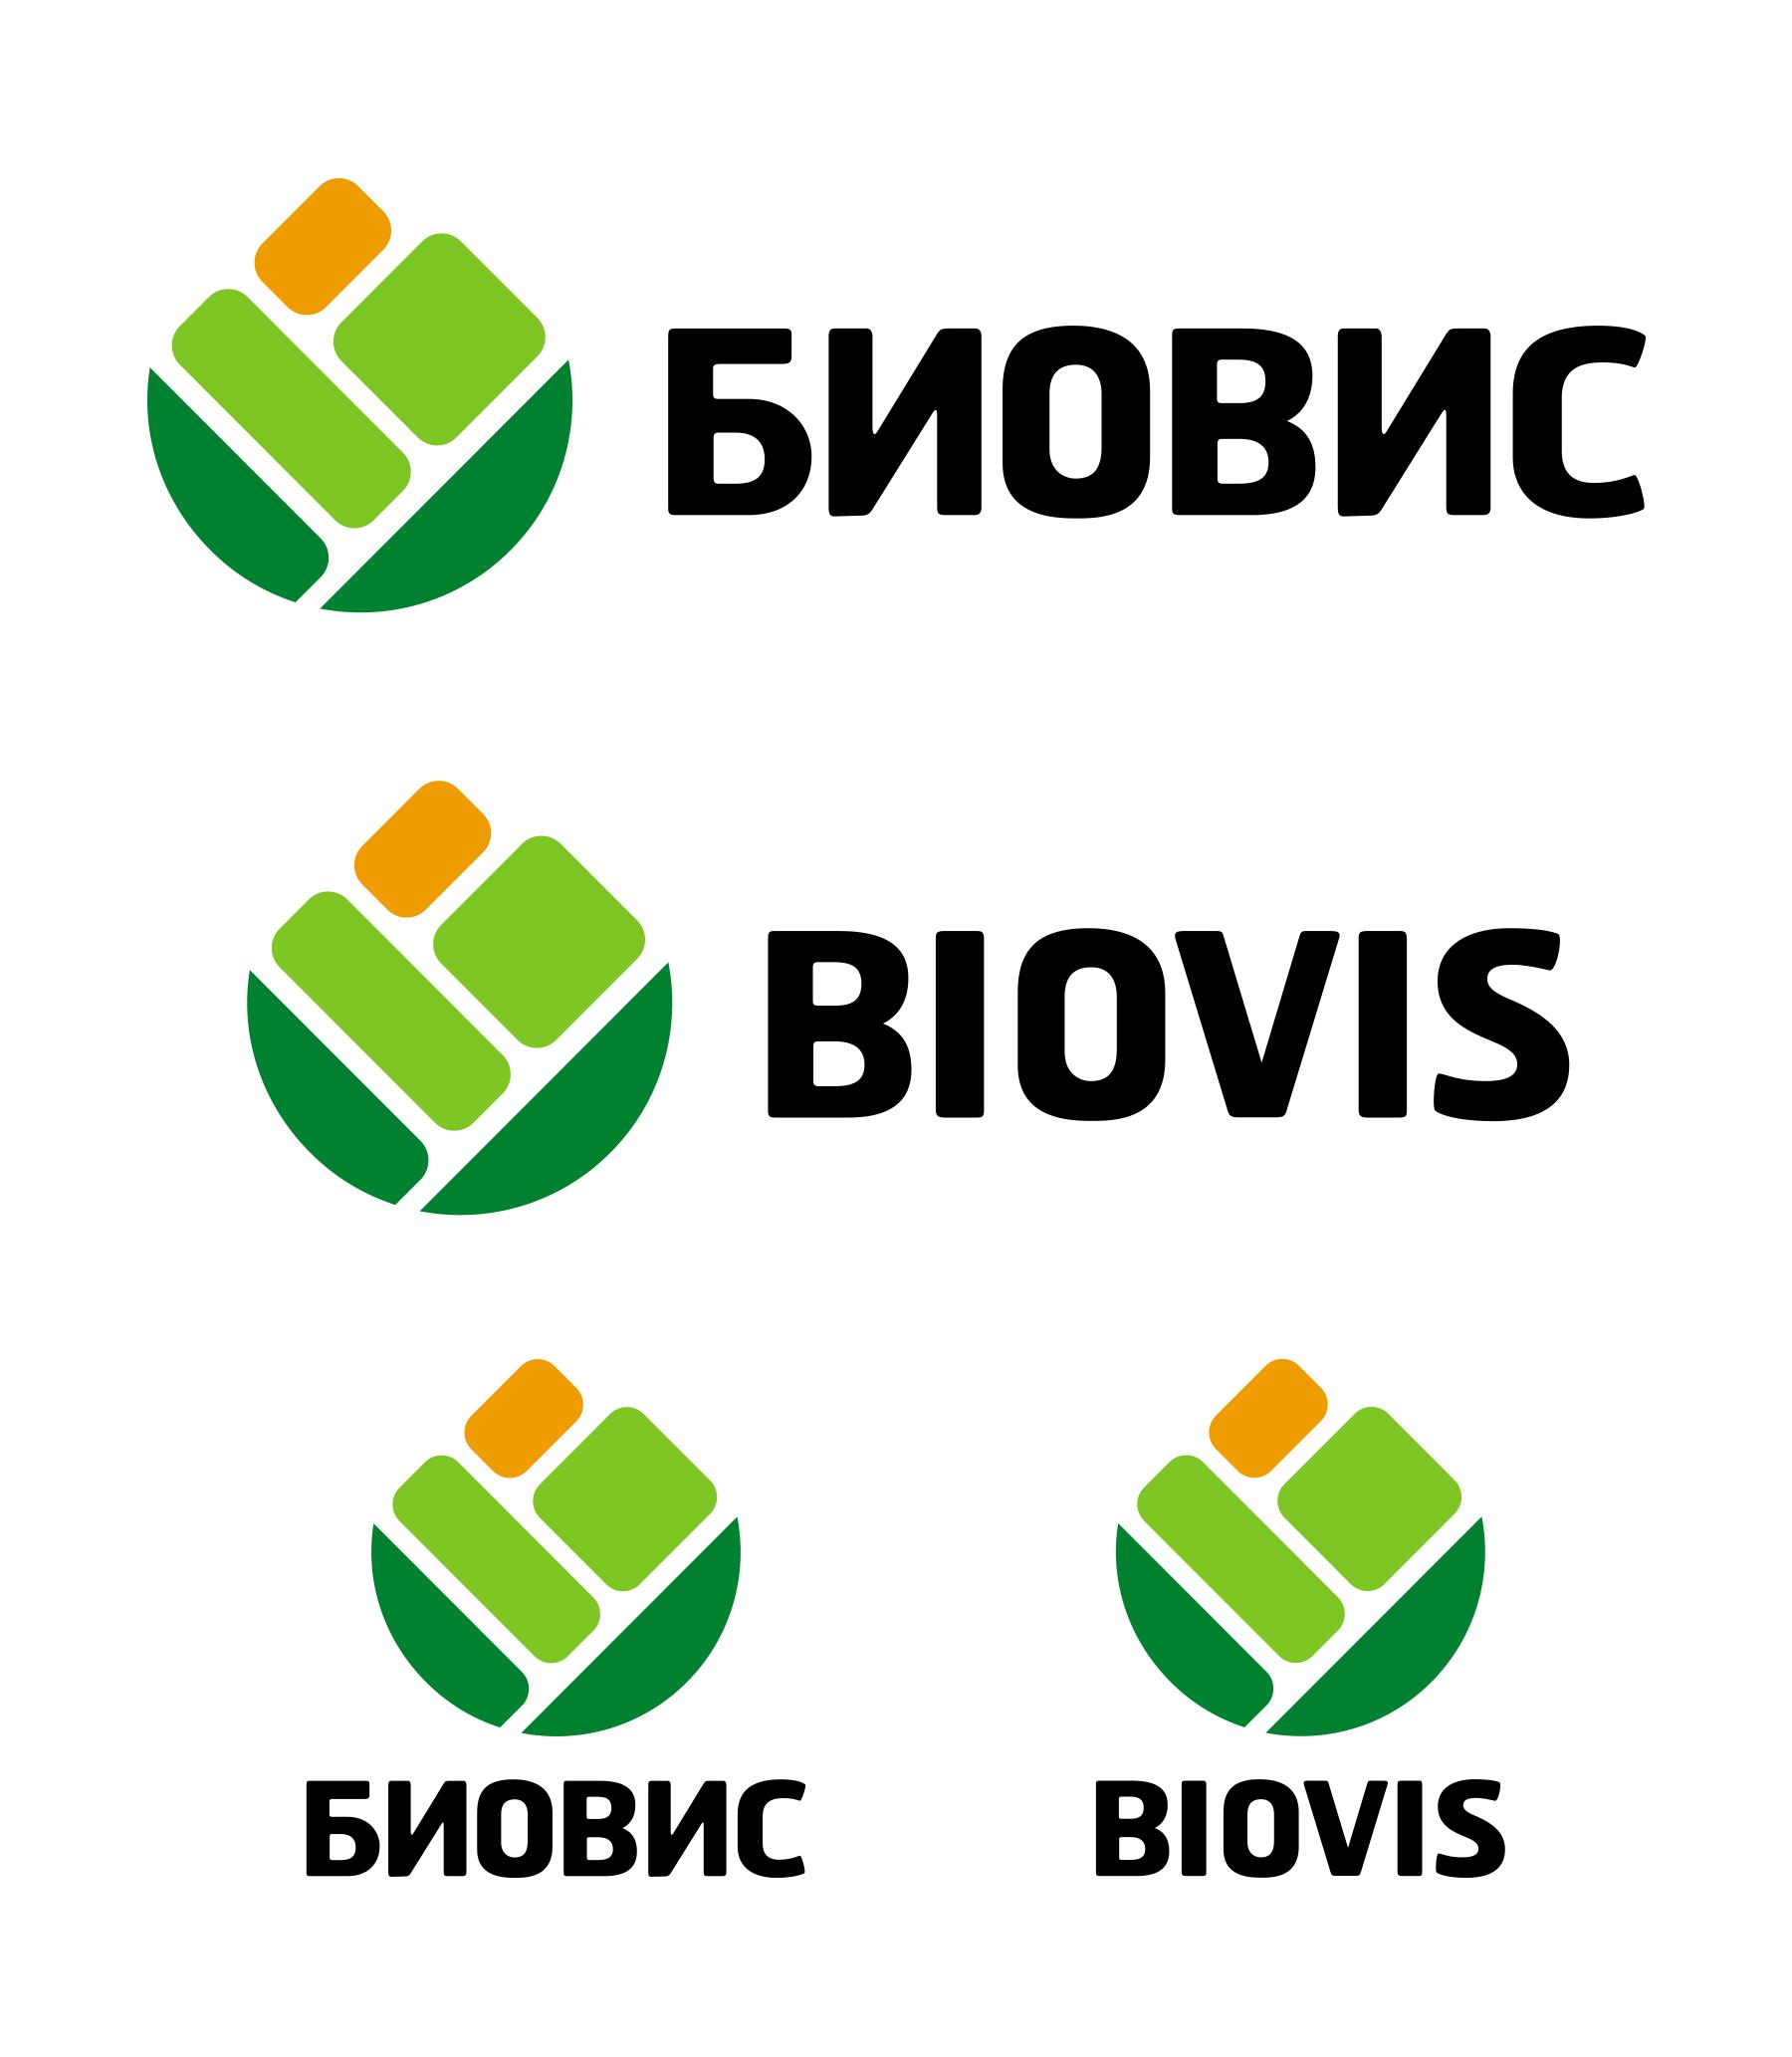 Графичен знак и логотип. Биовис. Латиница и кирилица.